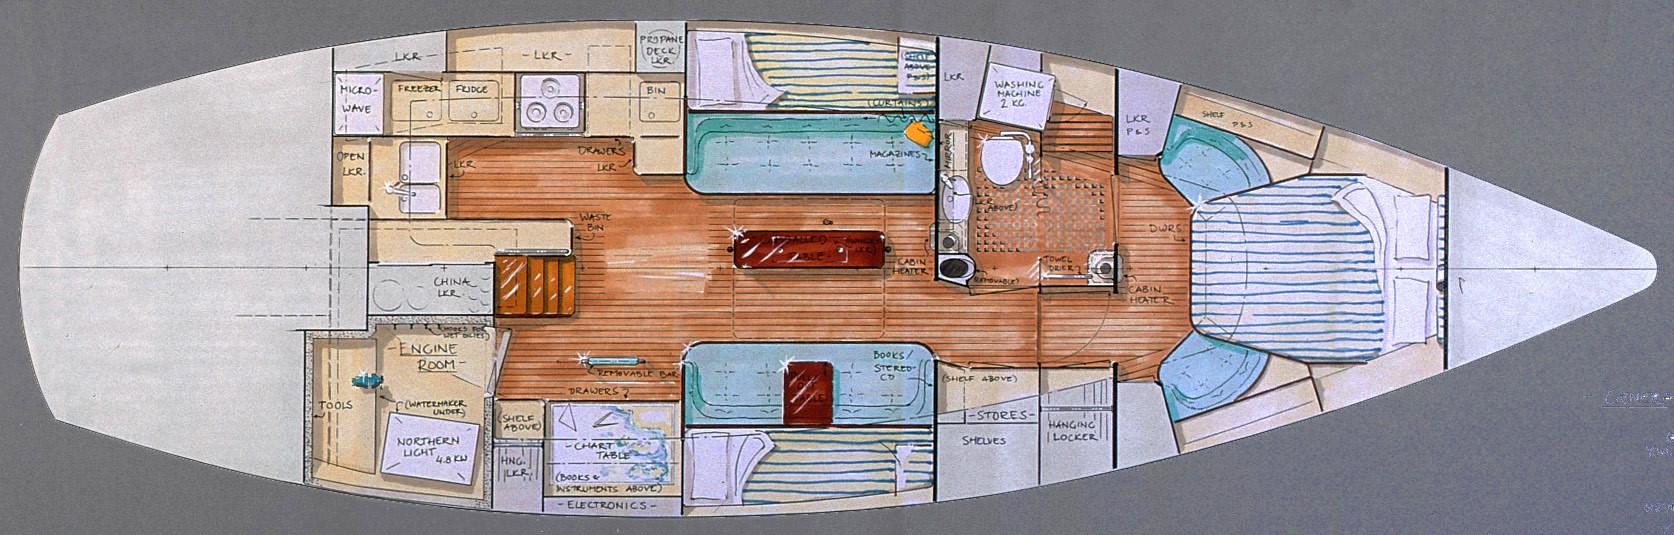 43' Freja, Interior